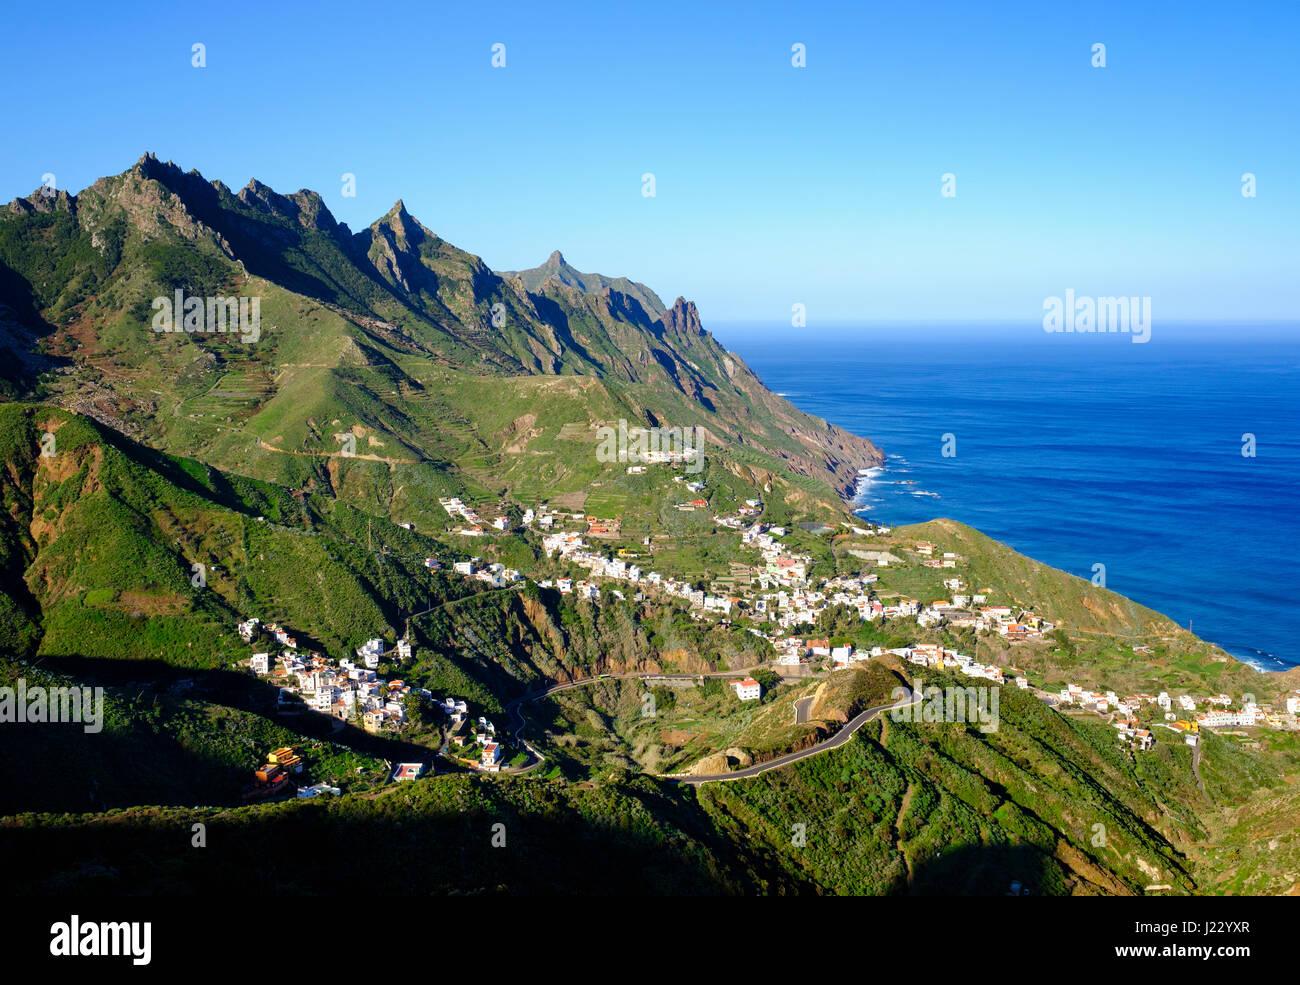 Taganana, Anaga-Gebirge, Teneriffa, Kanarische Inseln, Spanien Stockbild